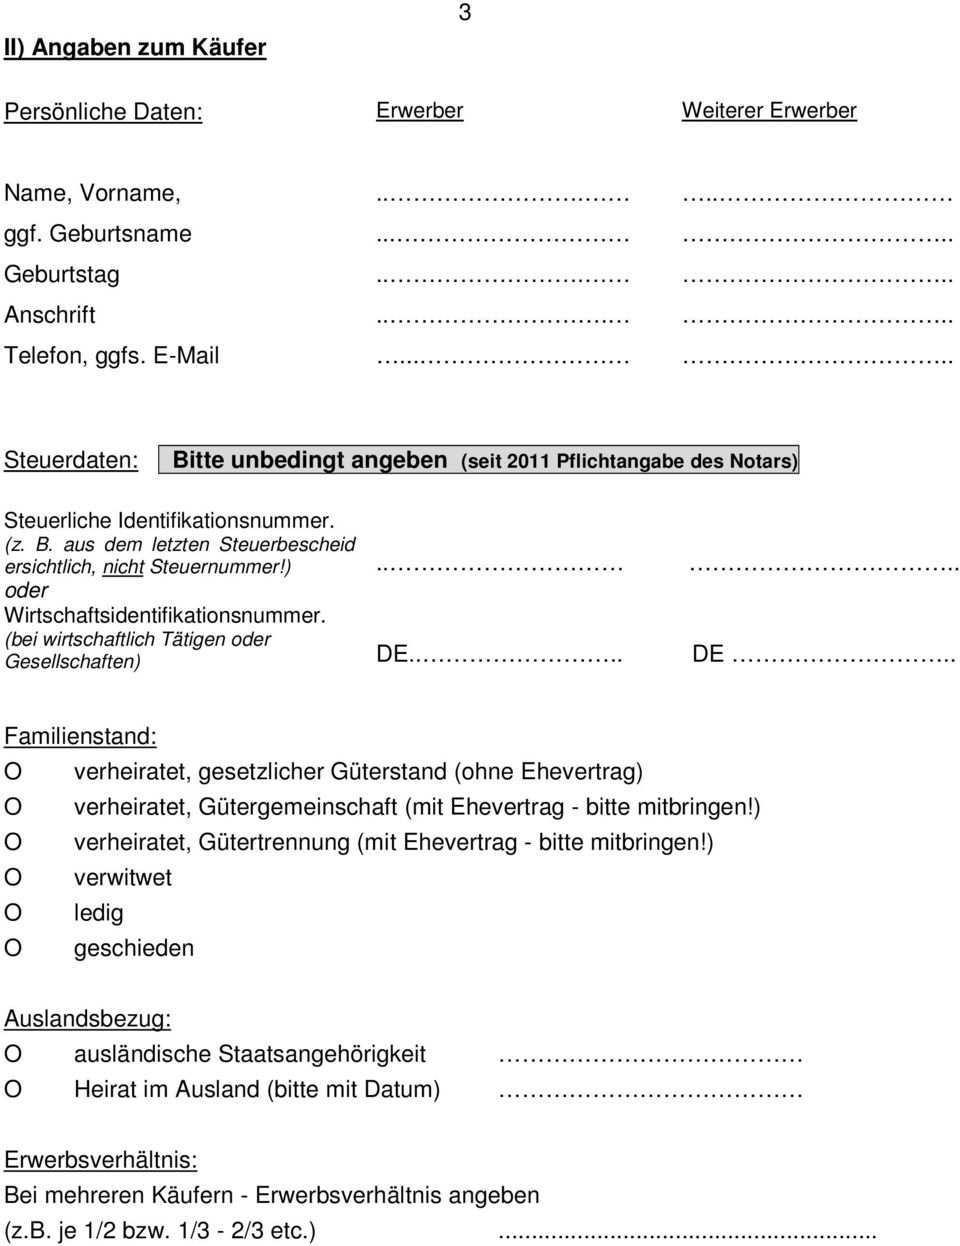 Fragebogen Kaufvertrag Pdf Free Download